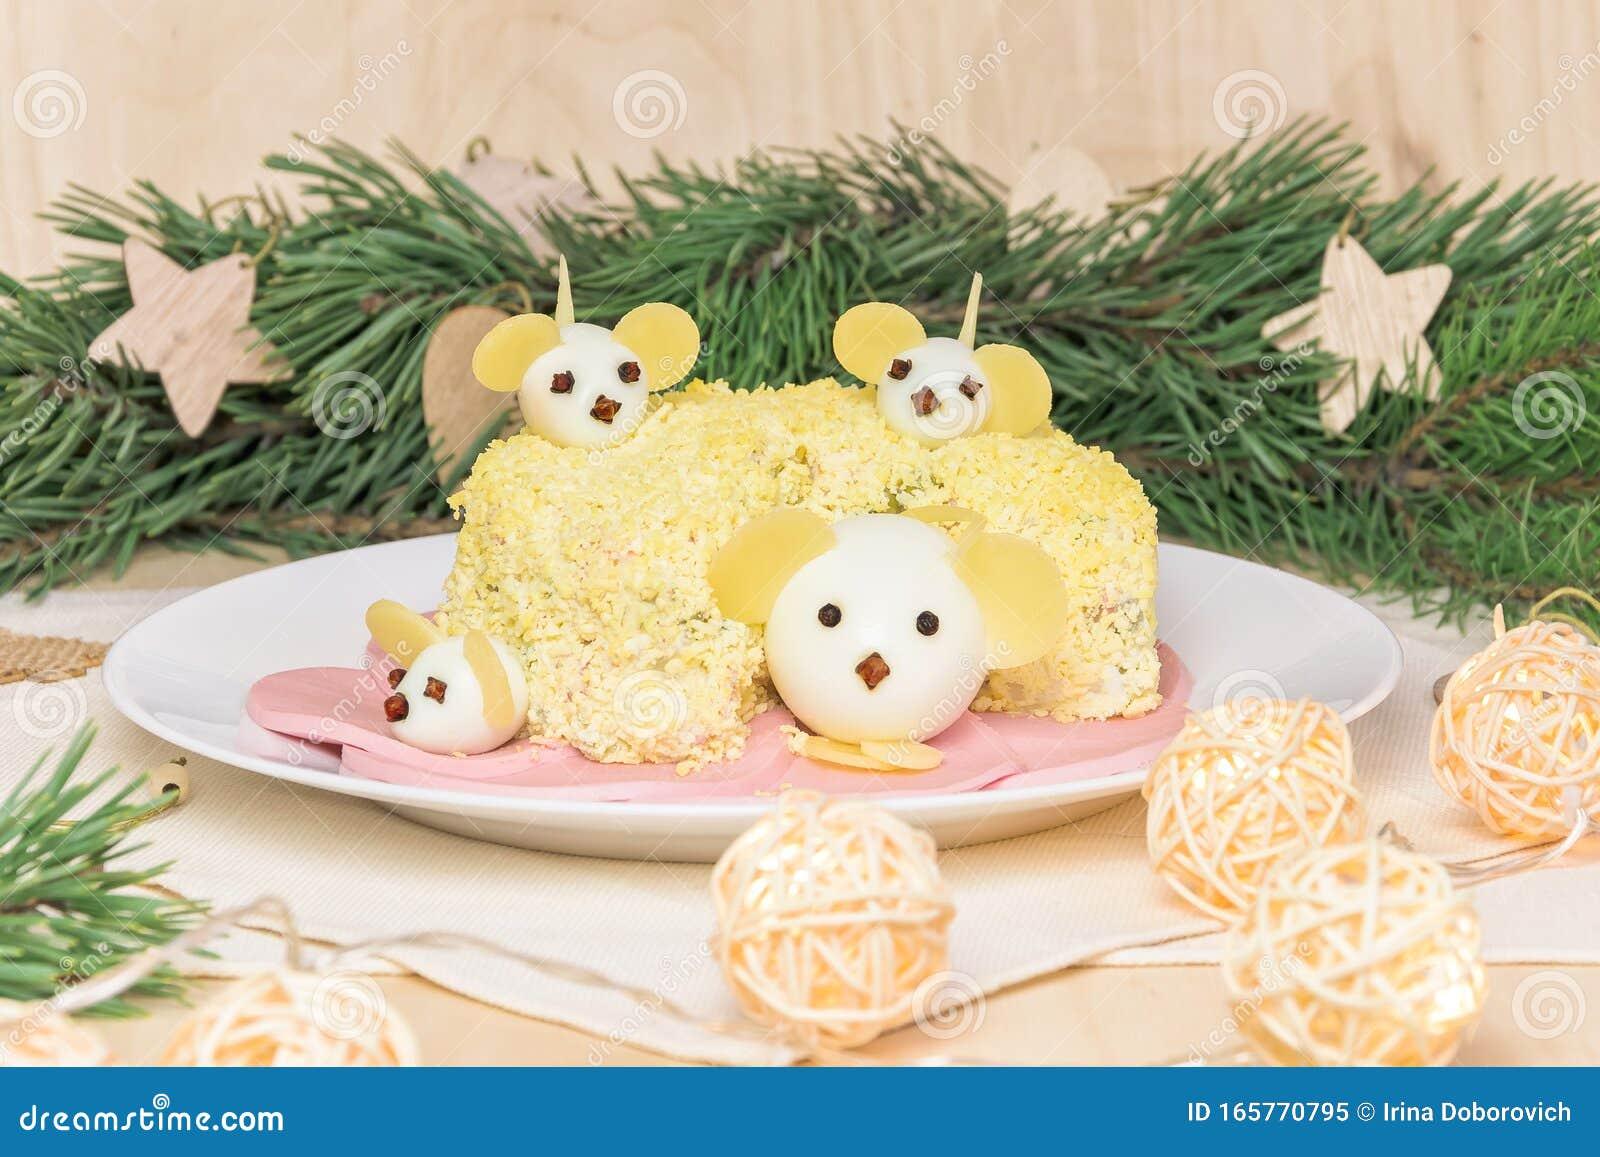 Menu For New Year. Holiday Christmas Salad 2020 New Year Cheese